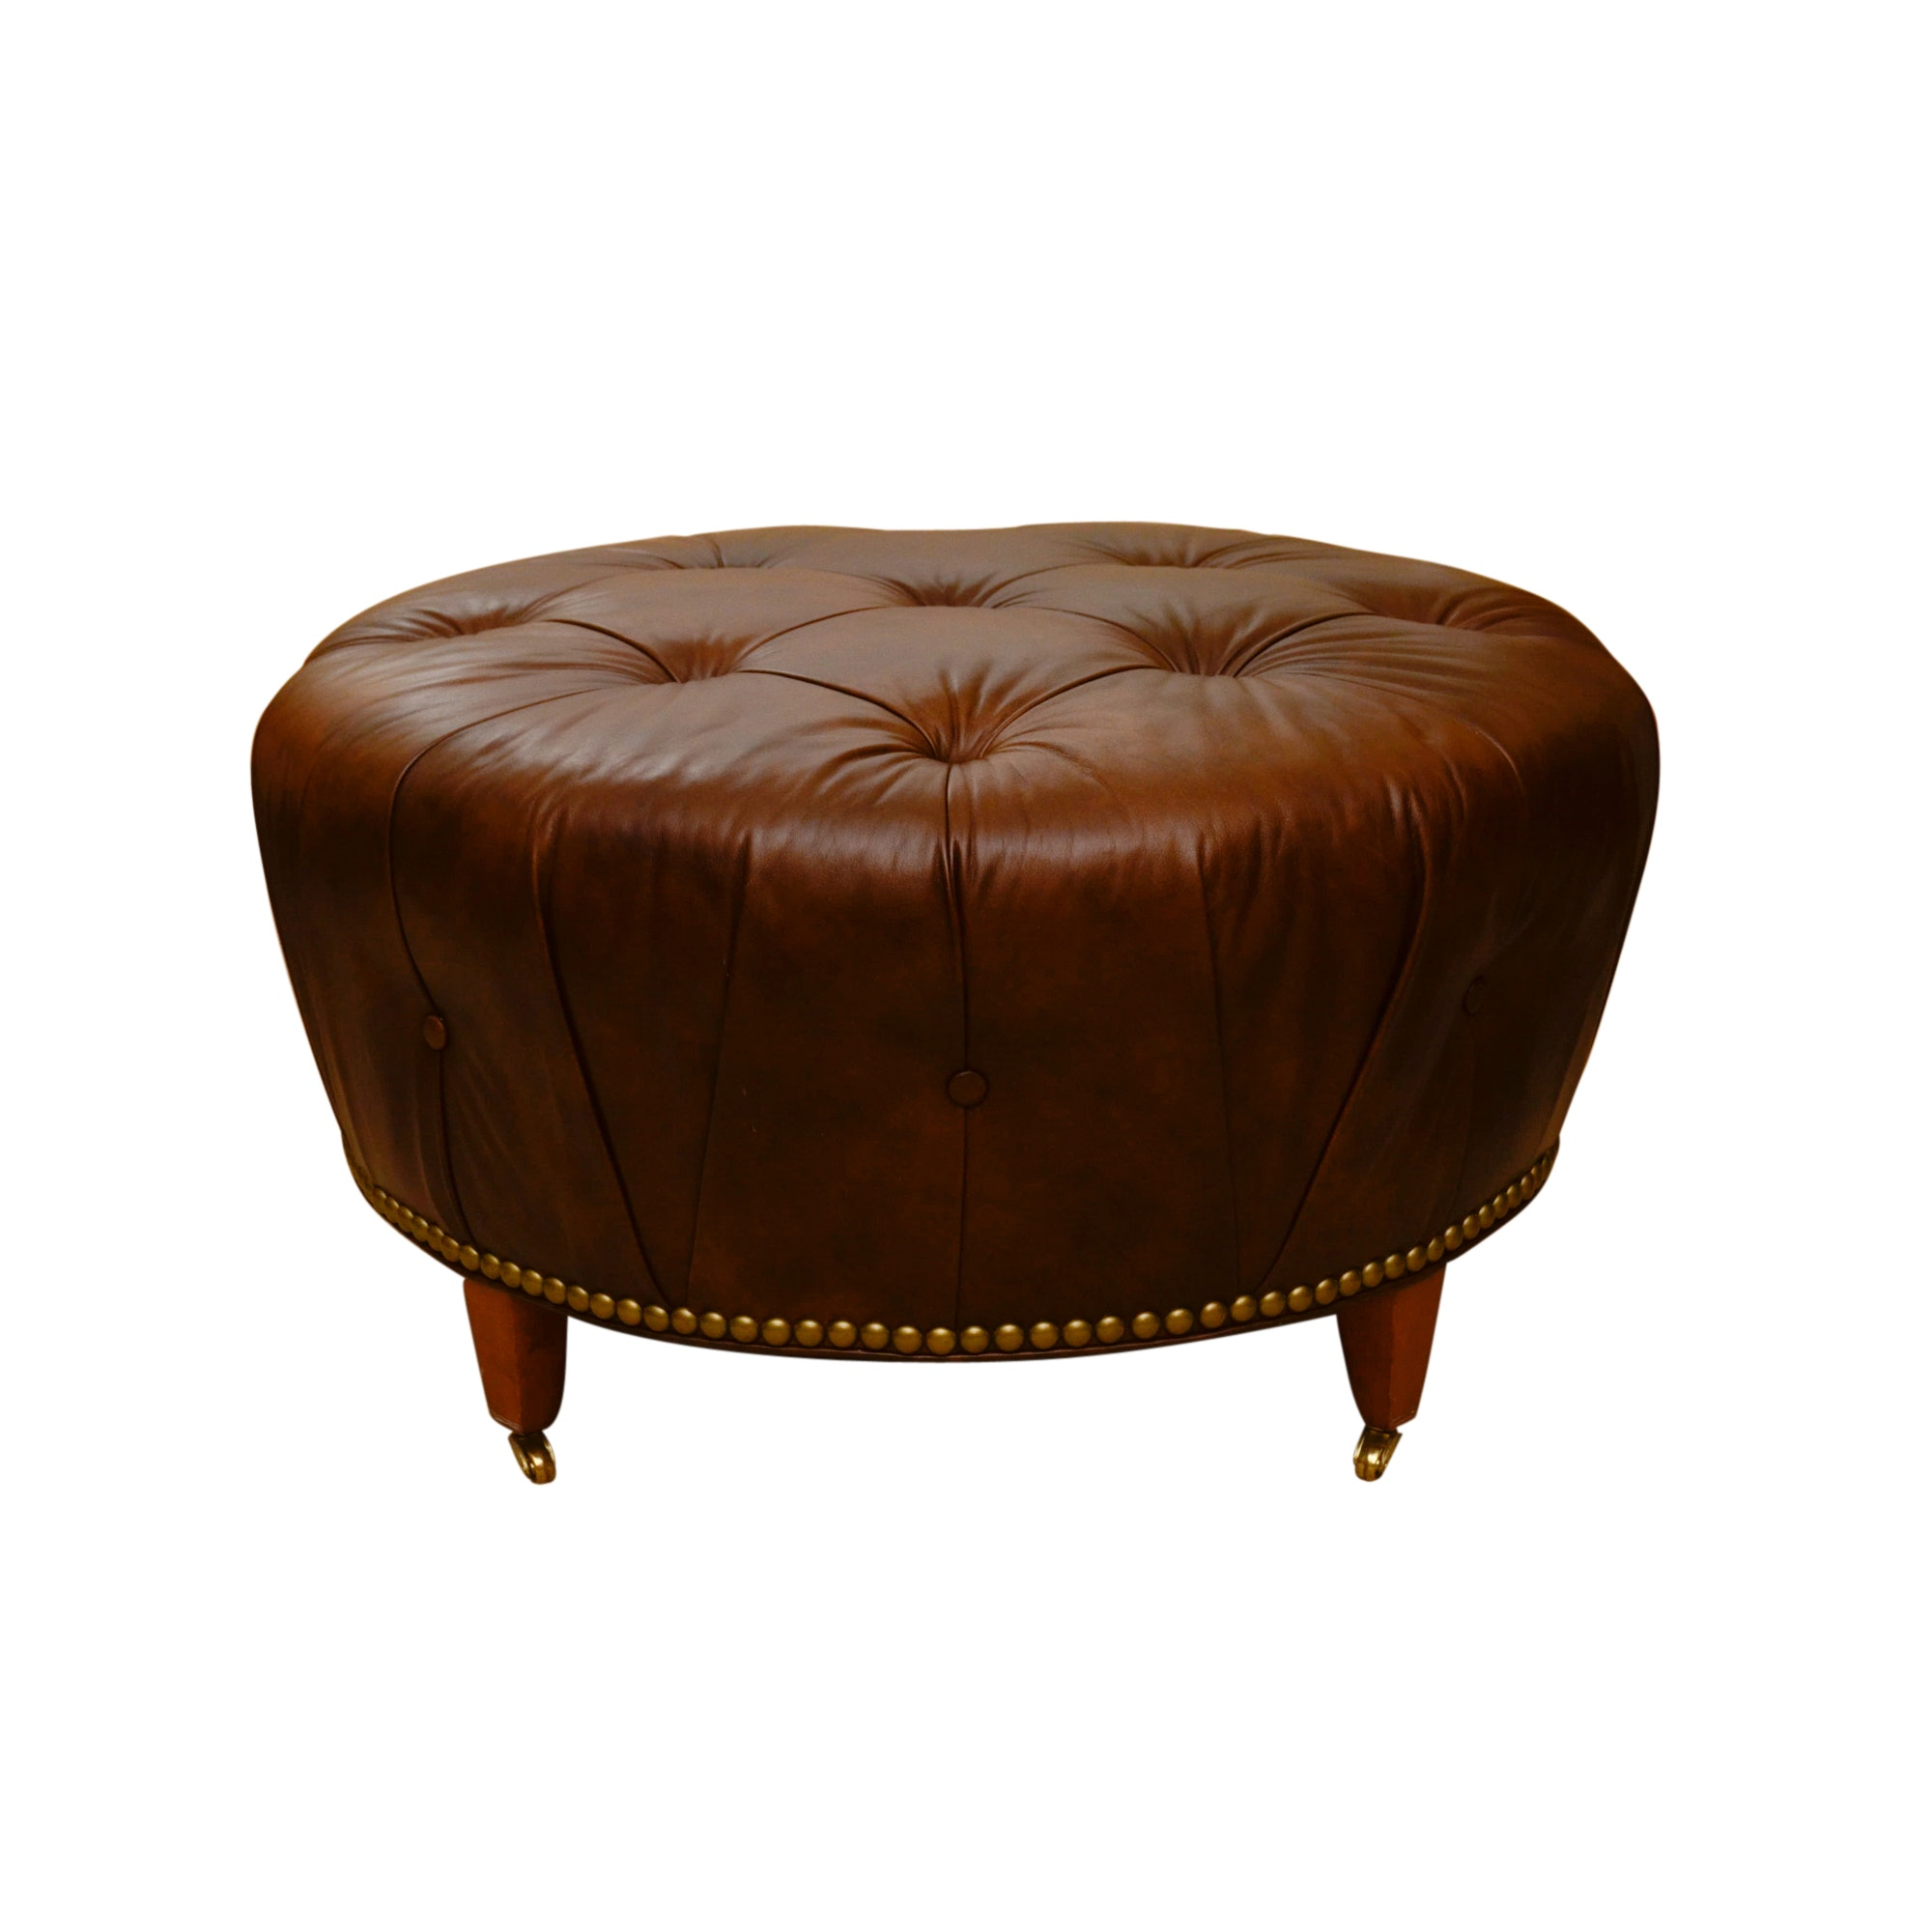 Vintage Button-Tufted Leather Ottoman